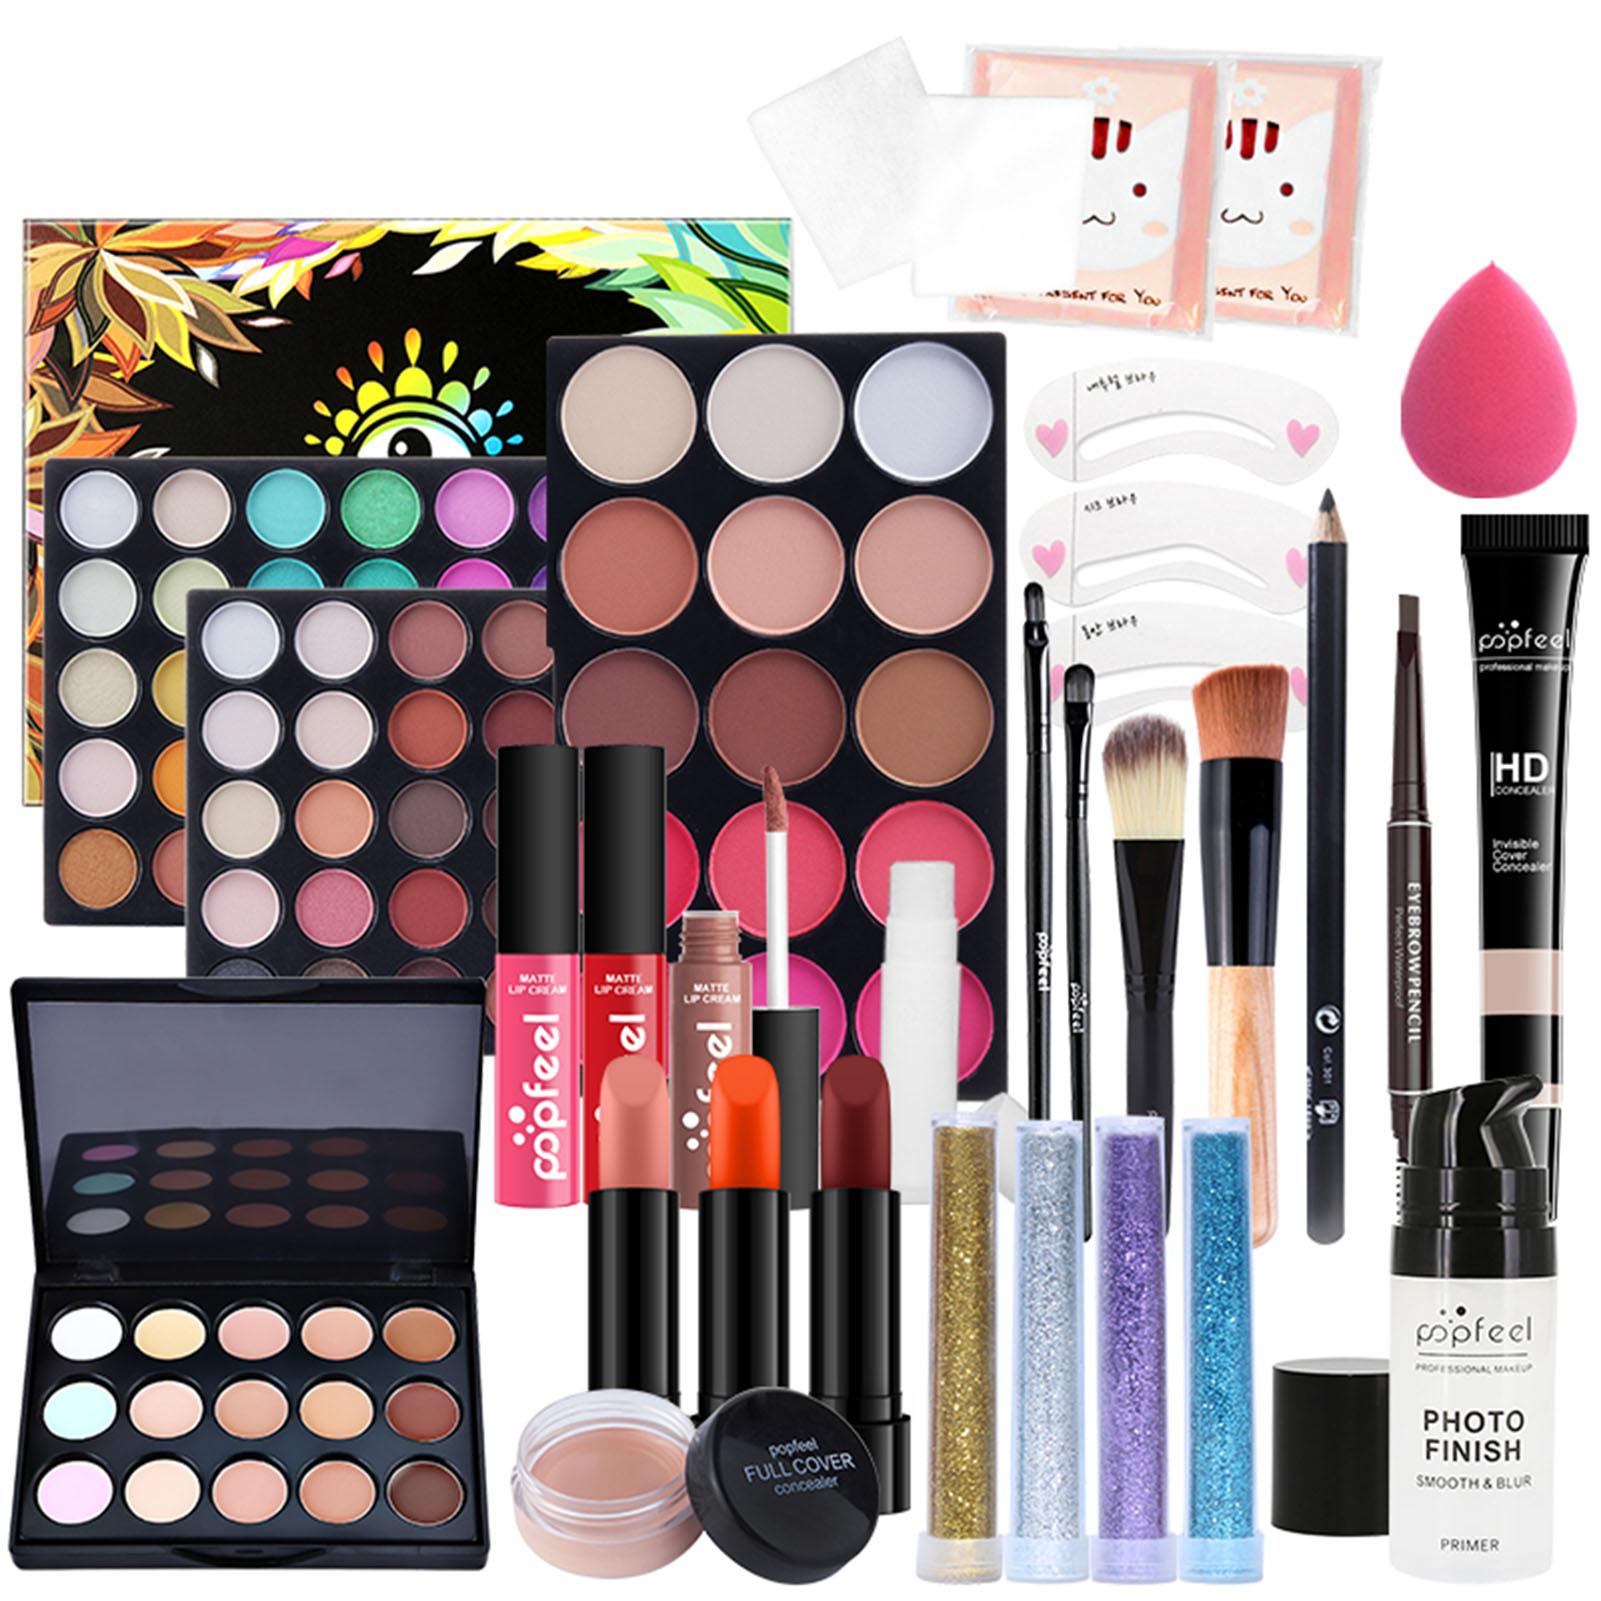 30Pcs All In One Makeup Kit Cosmetic Starter Kit Face Makeup Eyeshadow Lipstick Brush Eyeliner Powder Cosmetic Bag